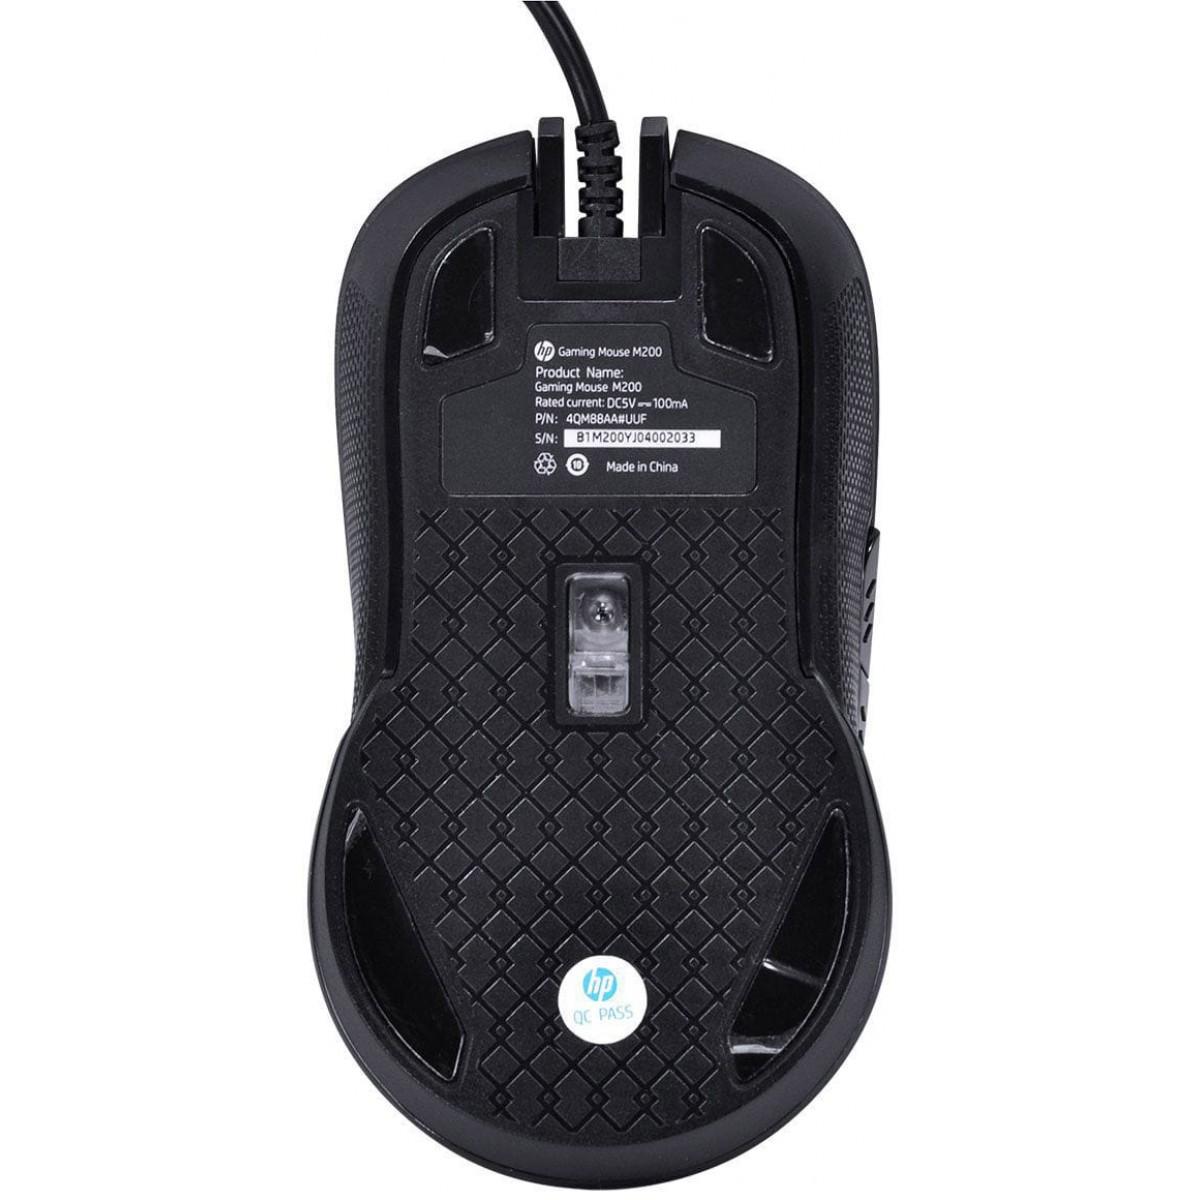 Mouse Gamer HP M200, 2400 DPI, Black